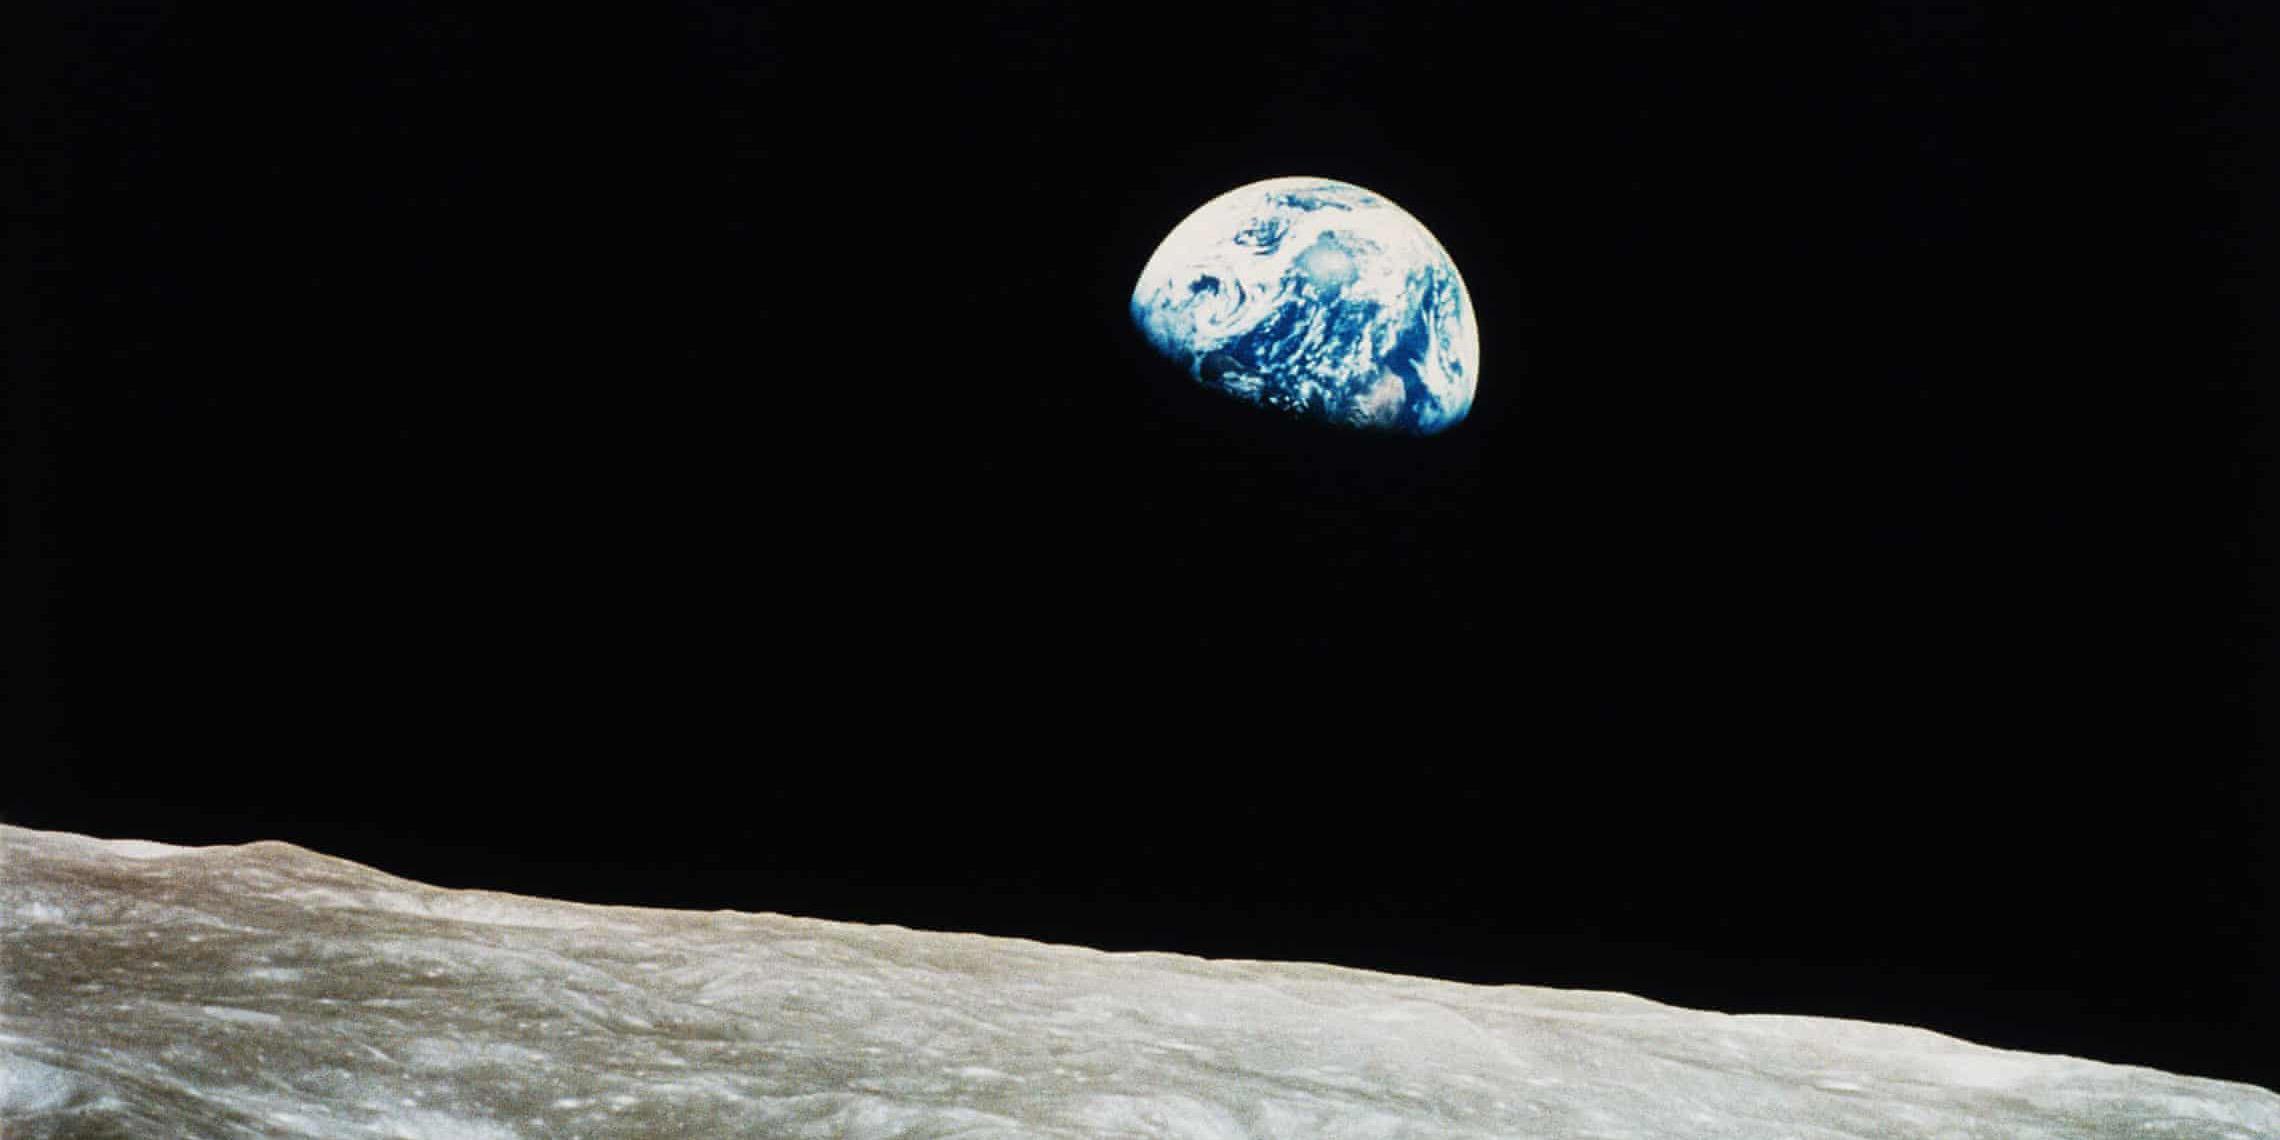 NASA human spaceflight chief resigns ahead of launch - Daily Maverick